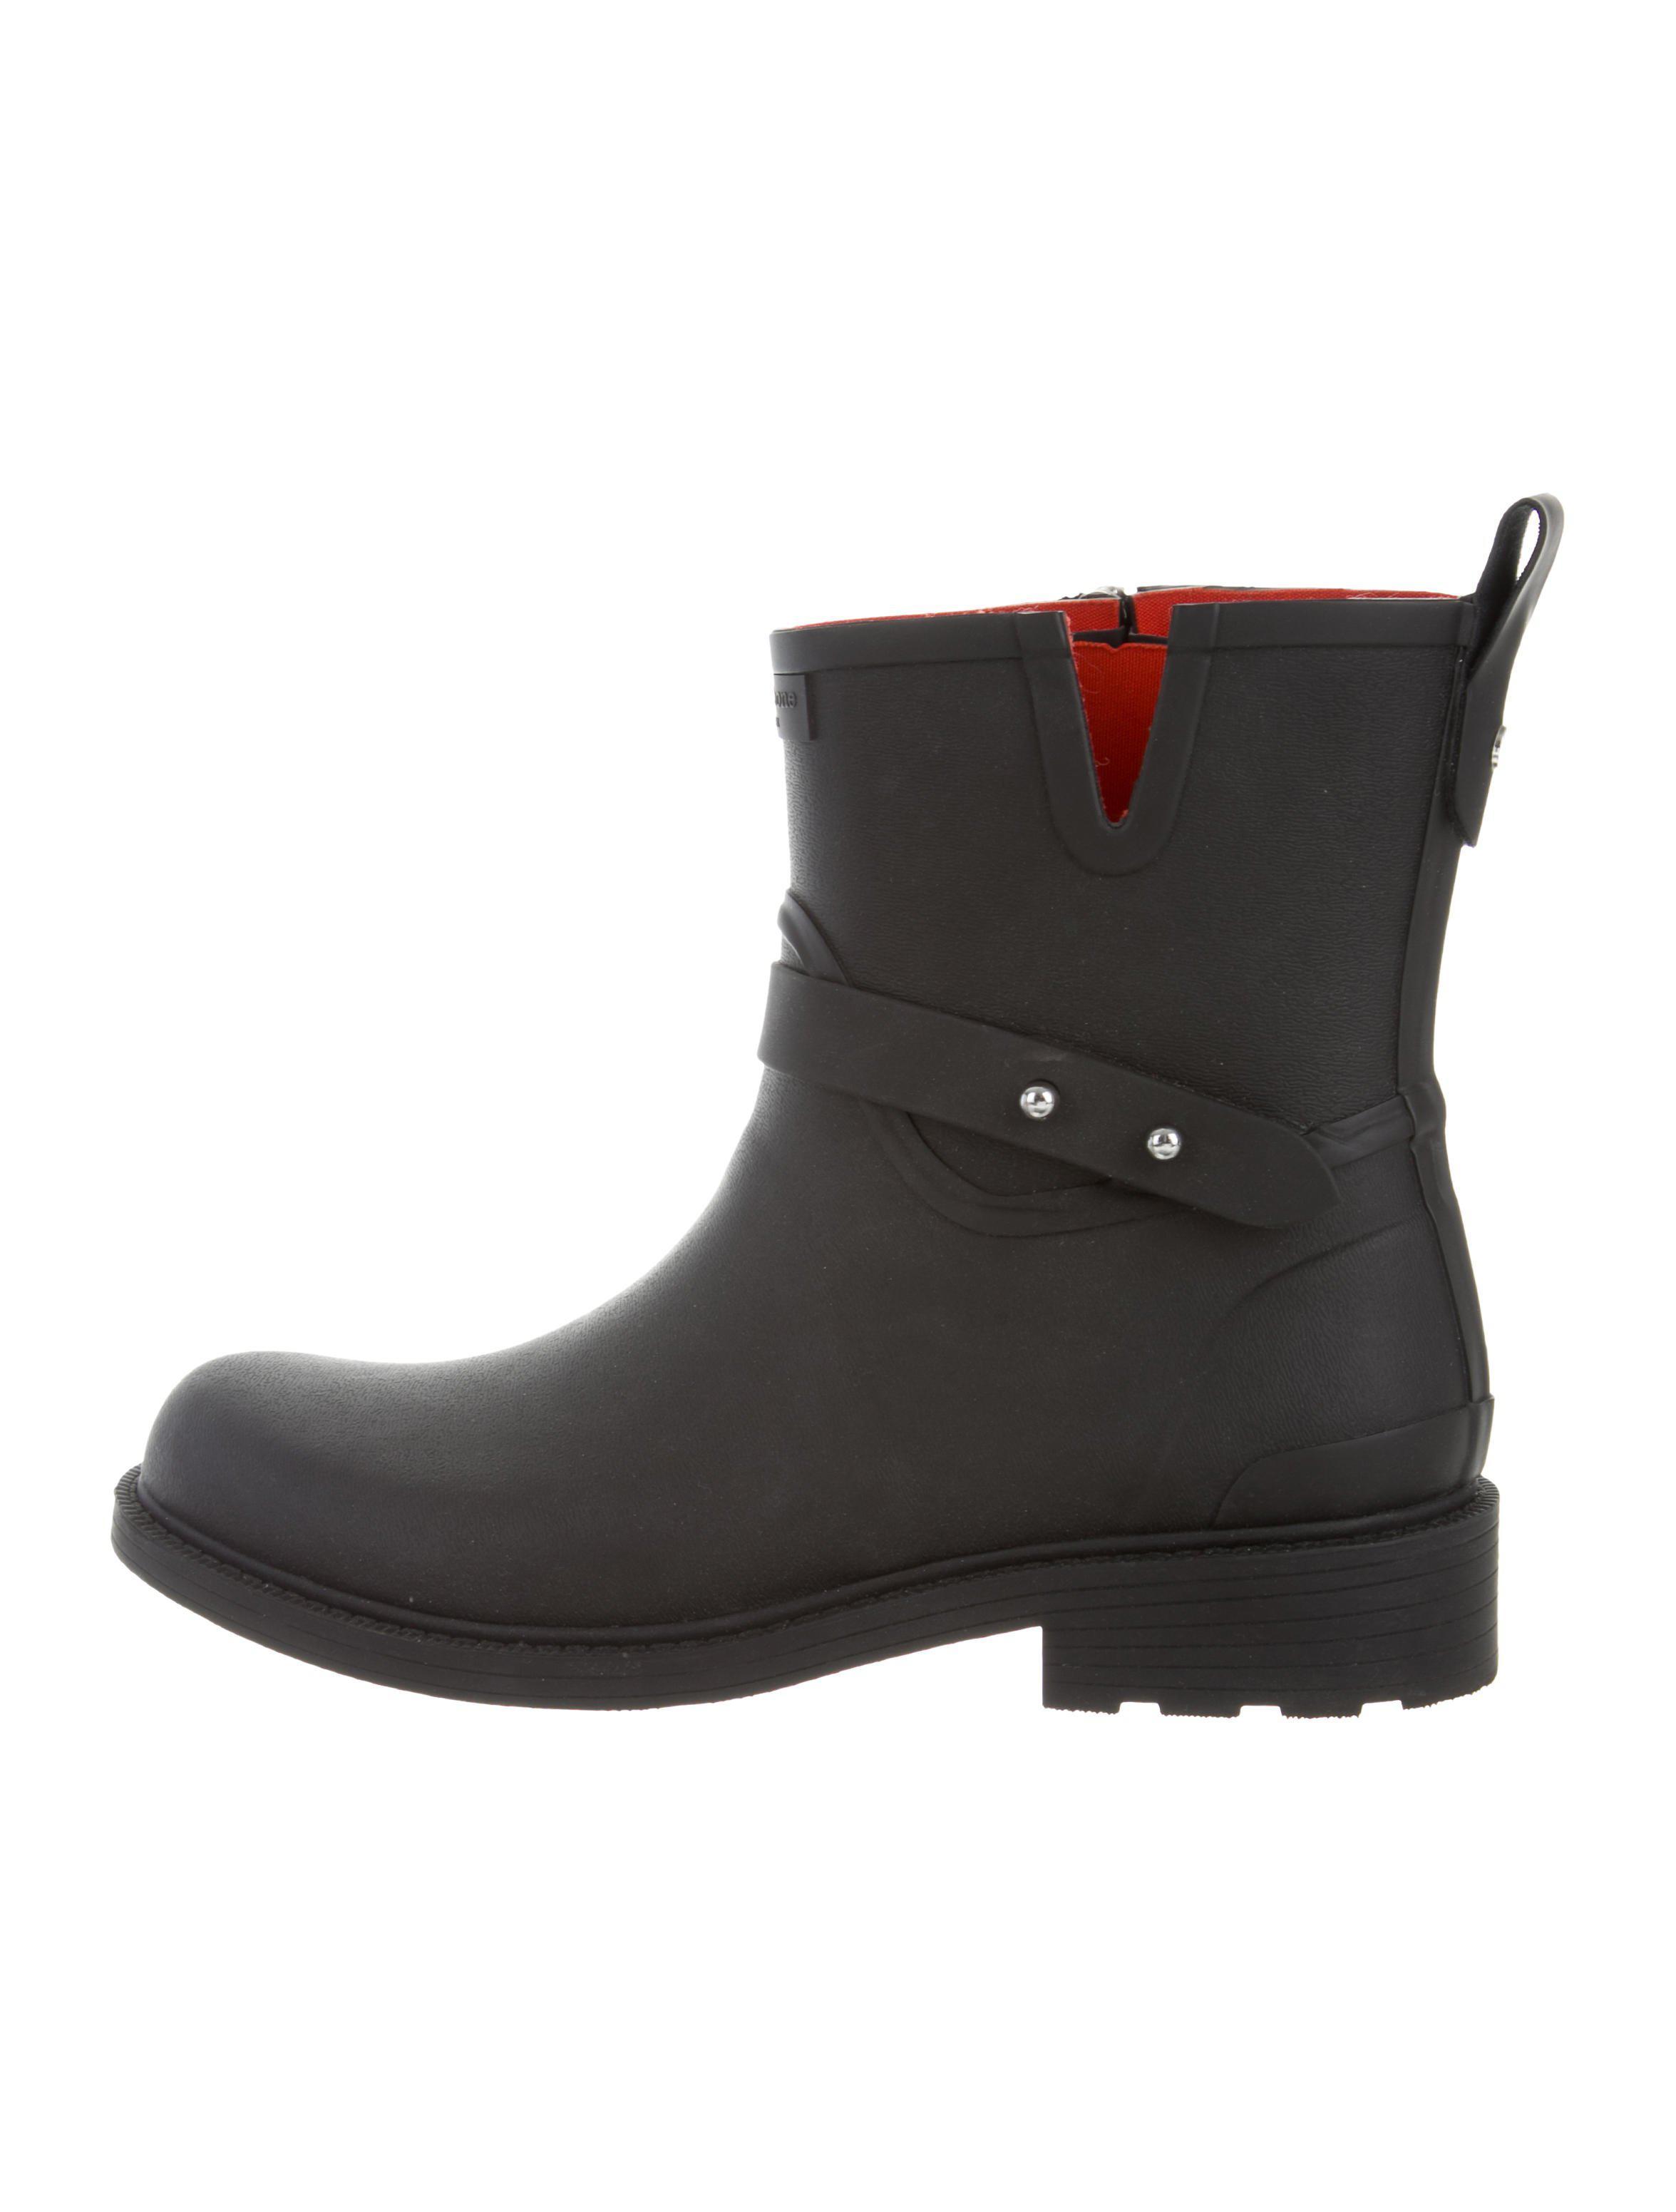 cheap sale view Rag & Bone Round-Toe Rain Boots visa payment cheap price cheap sale amazon eI1Xs